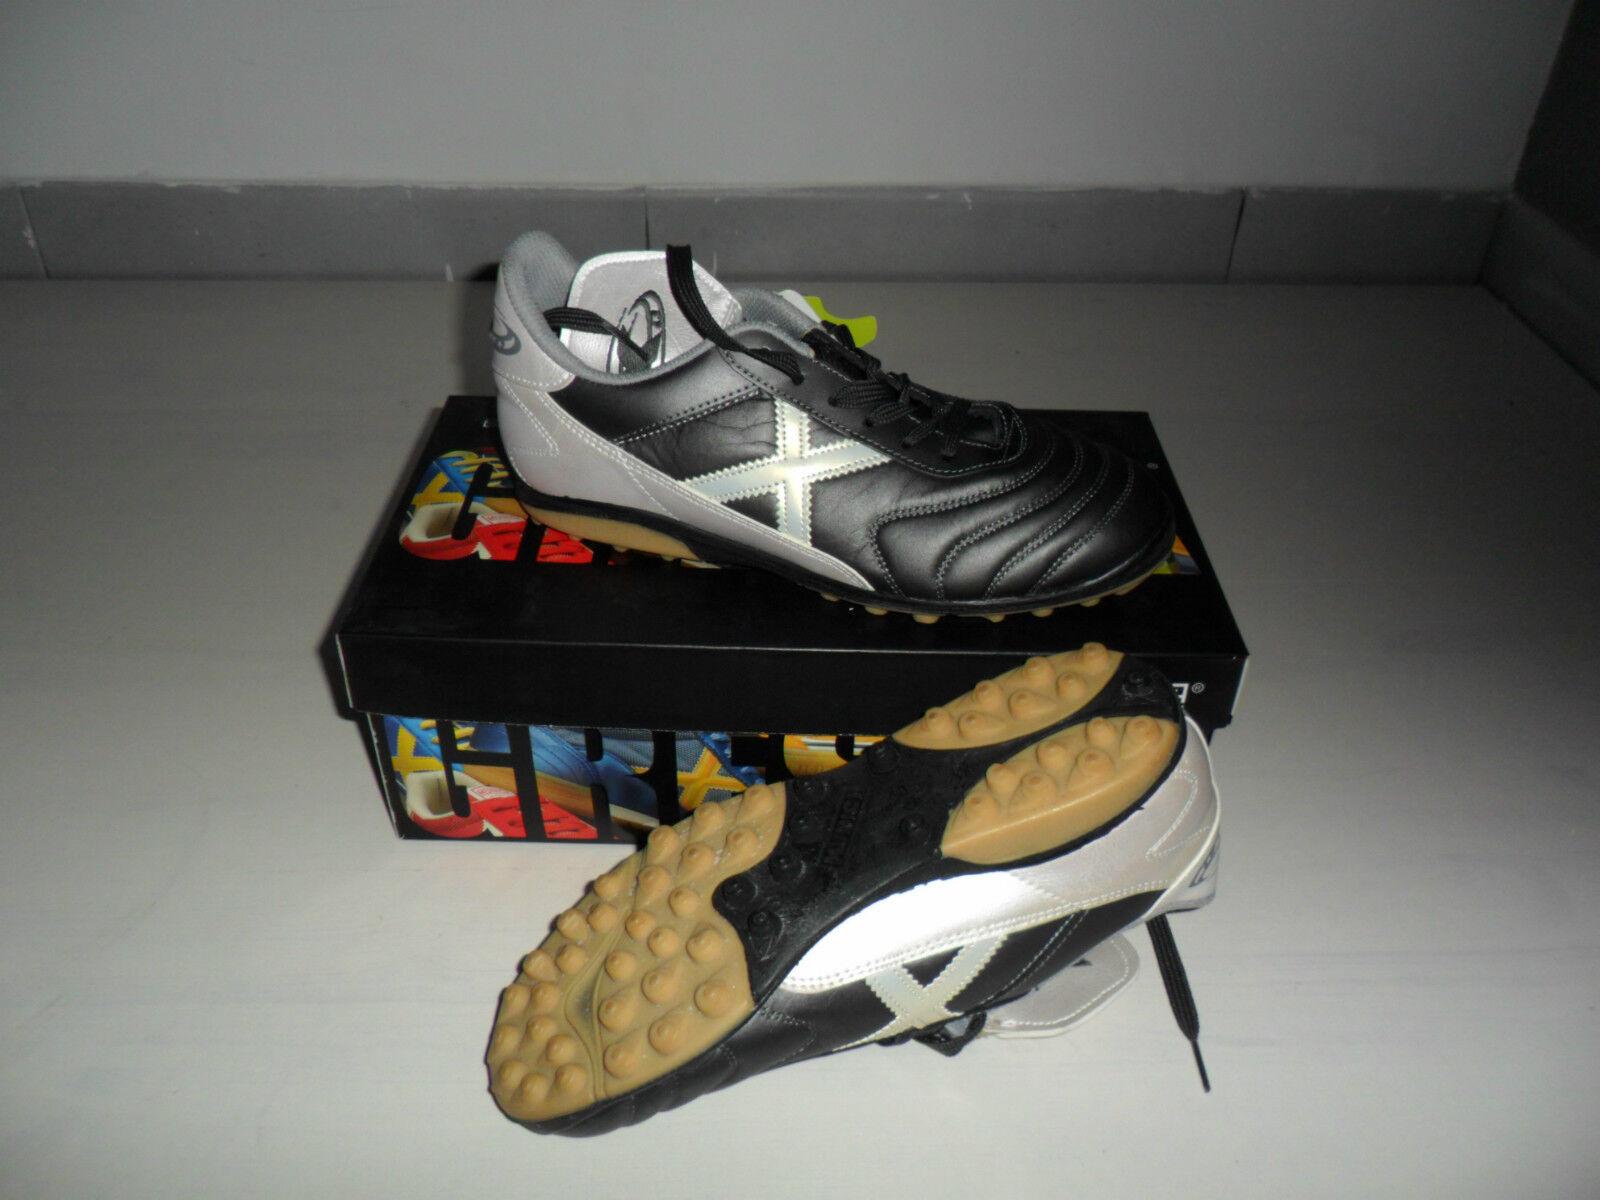 M43 MUNICH 0515 gris MUNDIAL 39 zapatos CALCETTO OUTDOOR TF FUTSAL bota SCARPINI